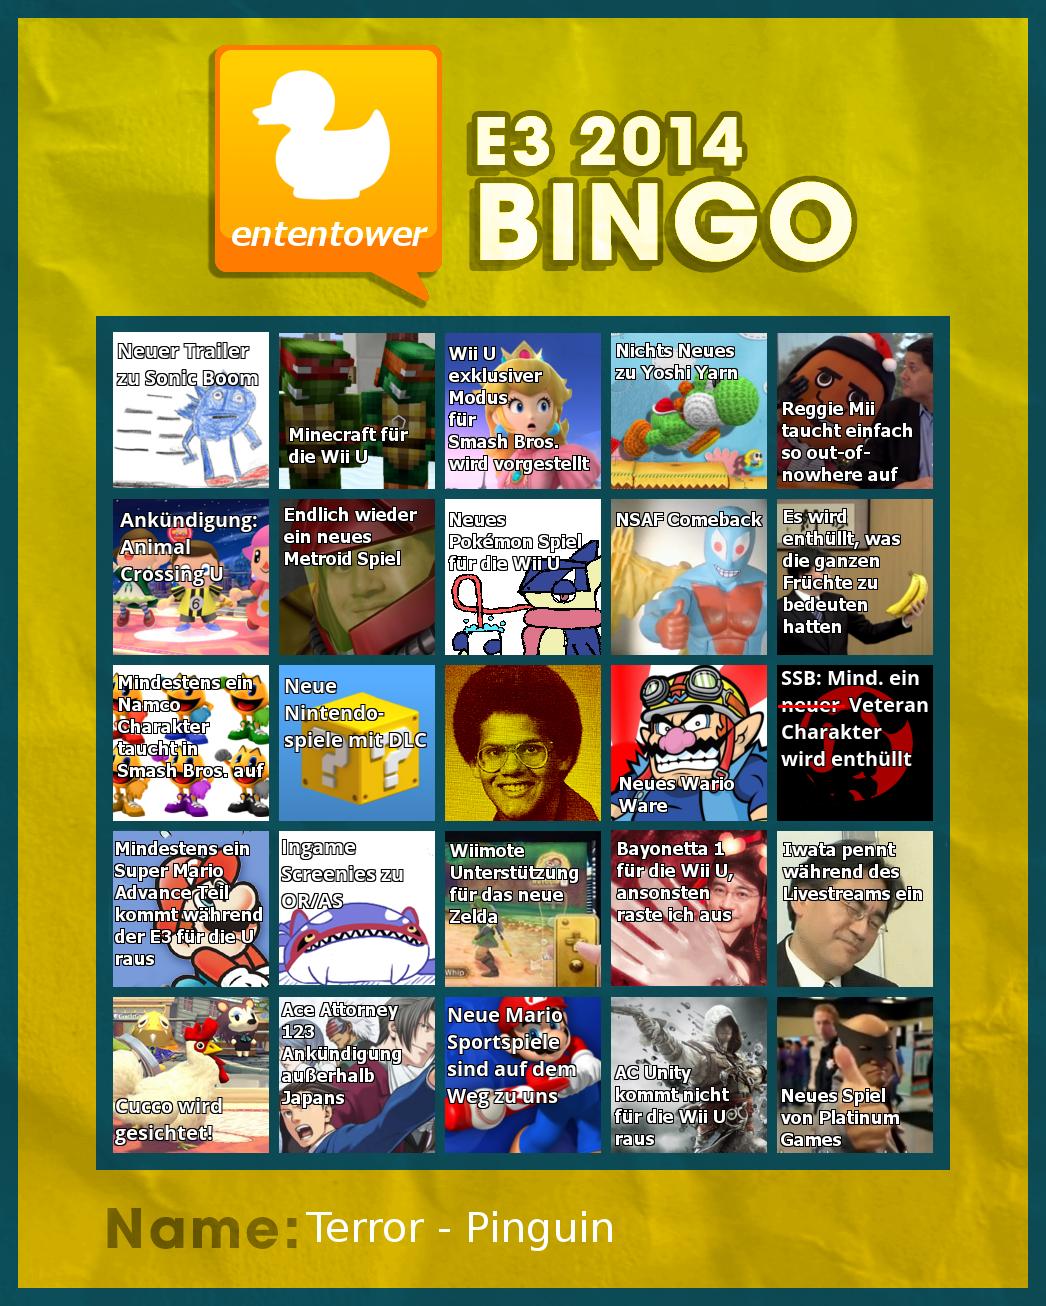 Ententower Bingo - 2014